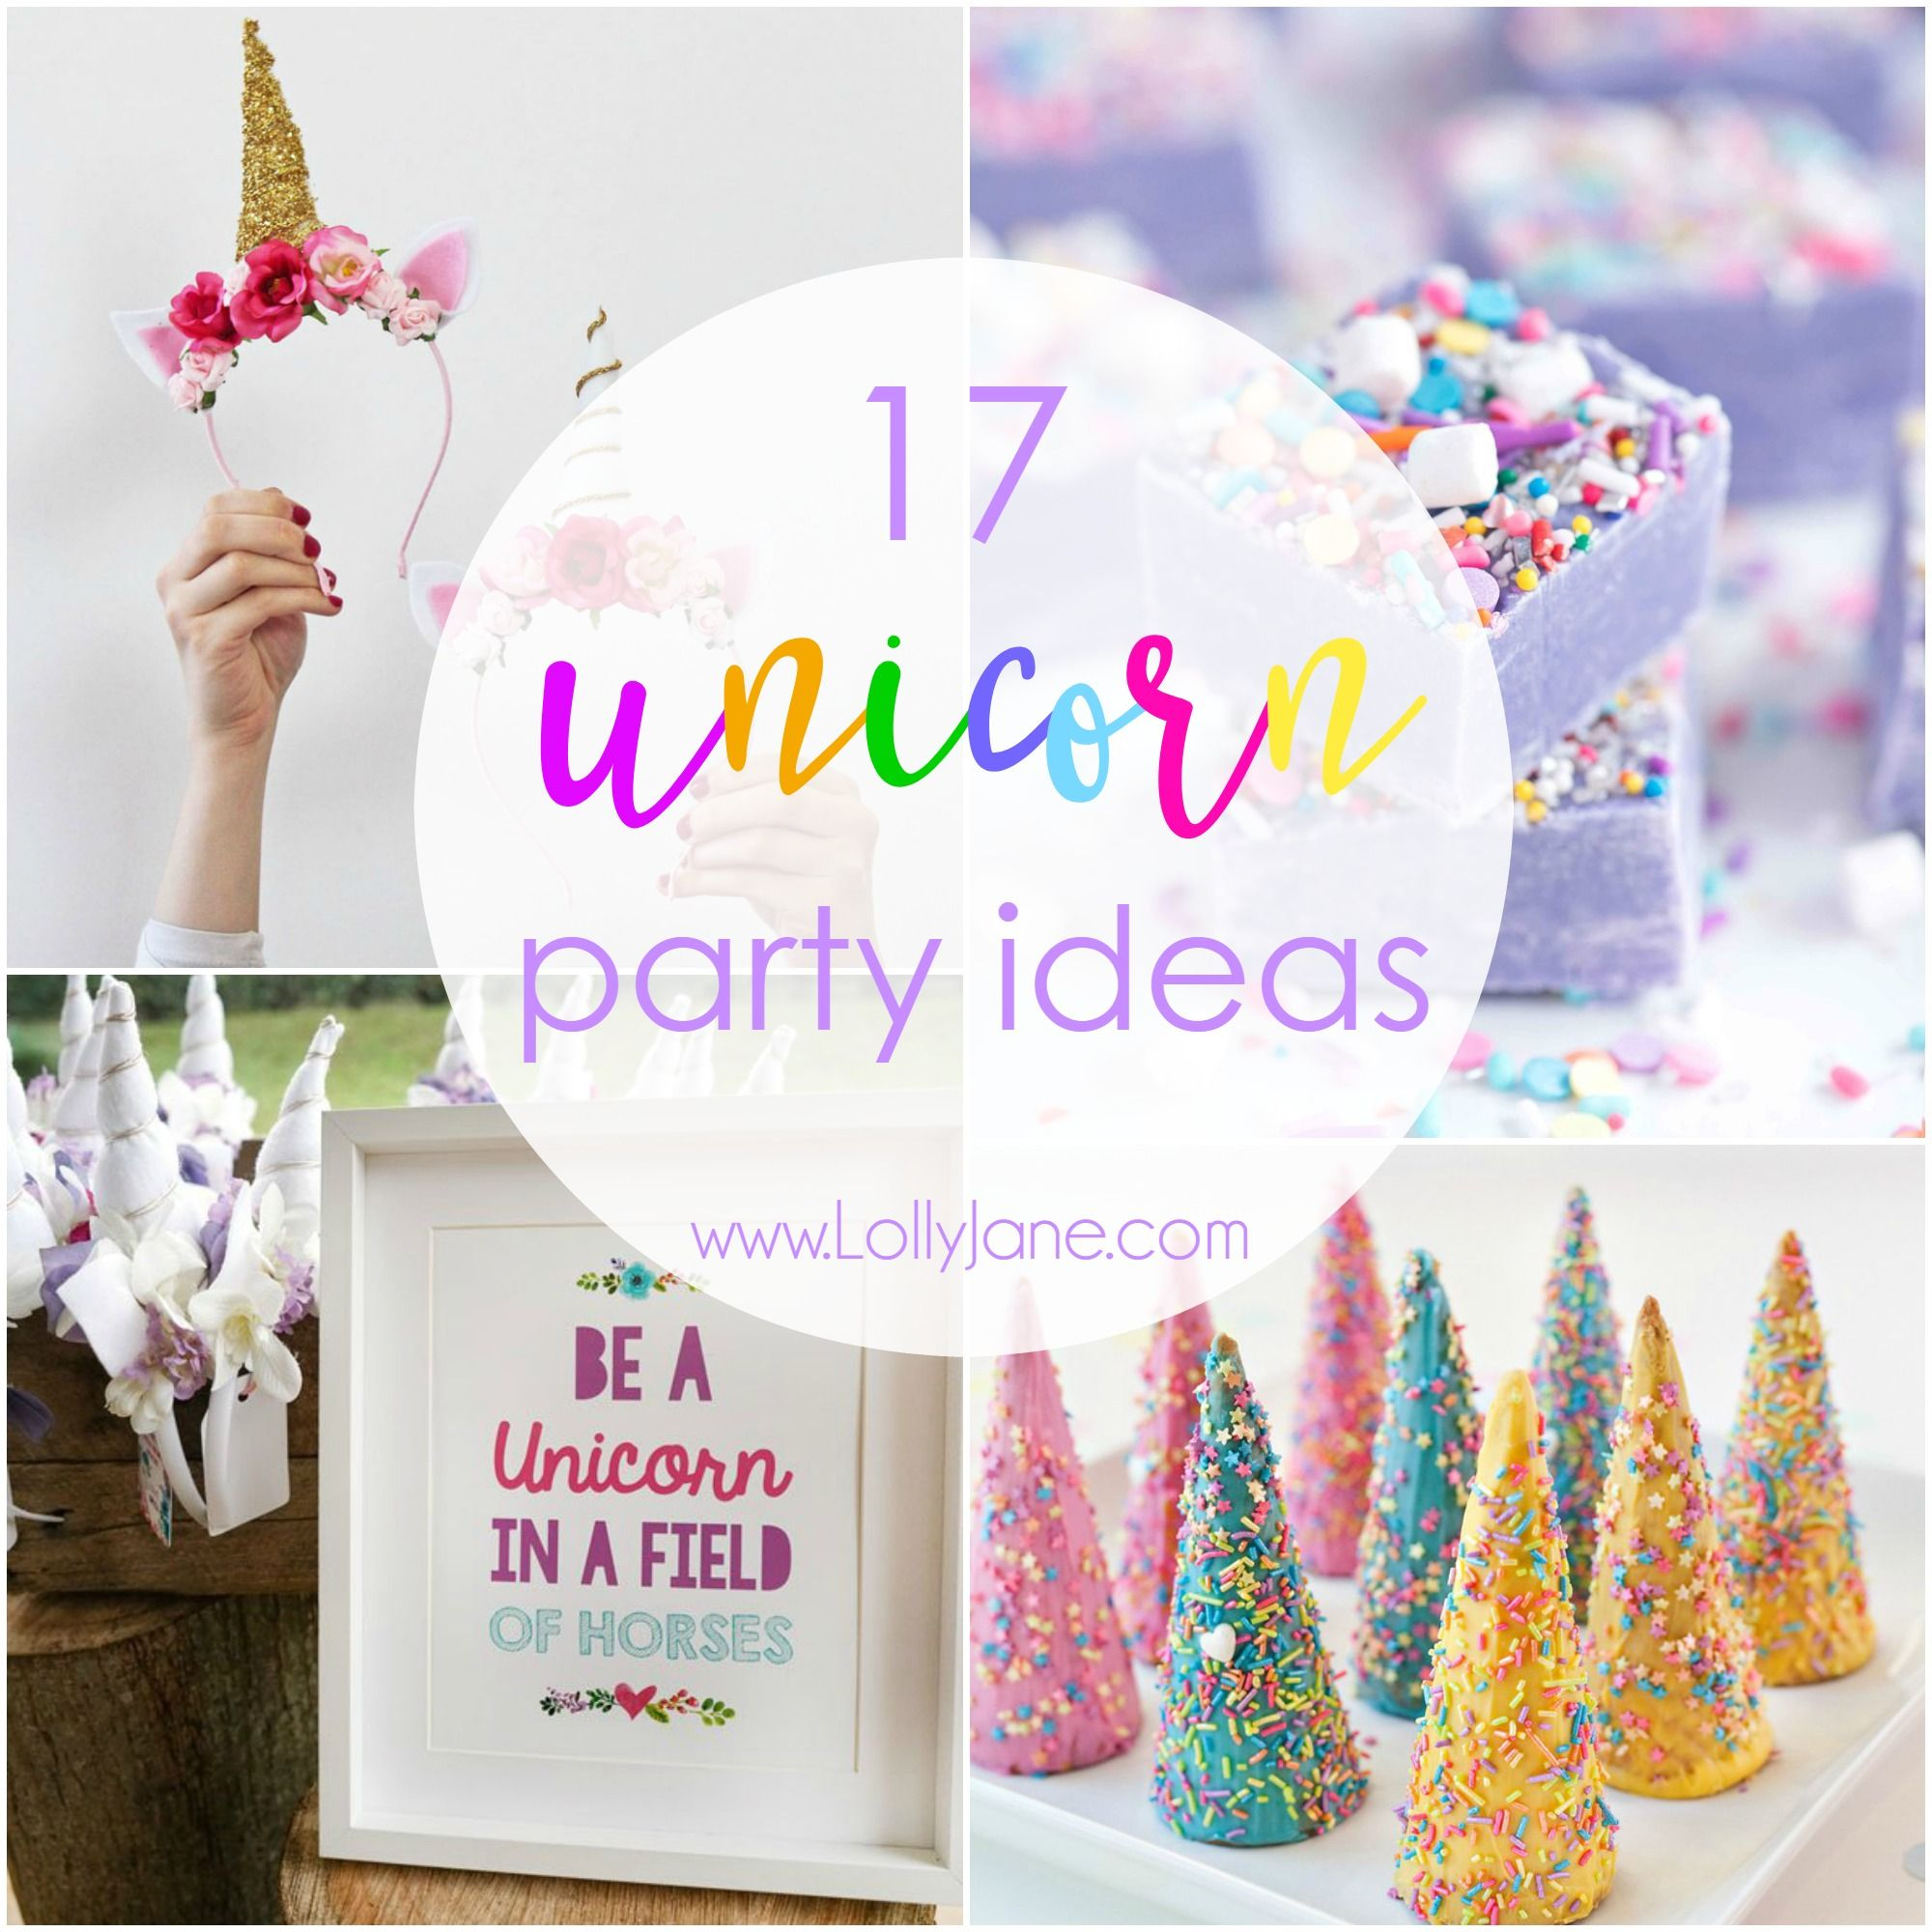 17 Unicorn Party Ideas To Throw The Ultimate Unicorn Party | Unicorn ...